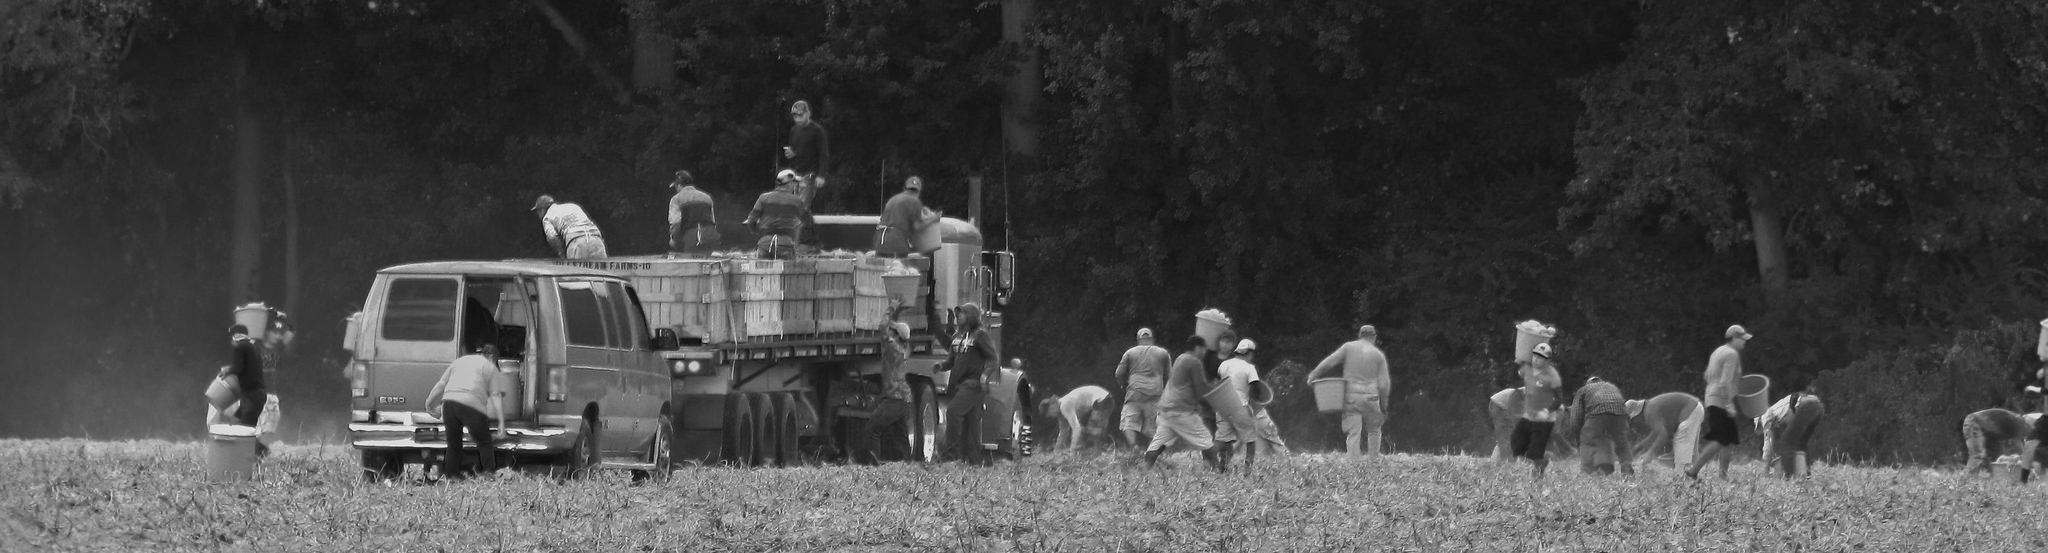 Migrant farm workers | © Gerry Dincher/Flickr